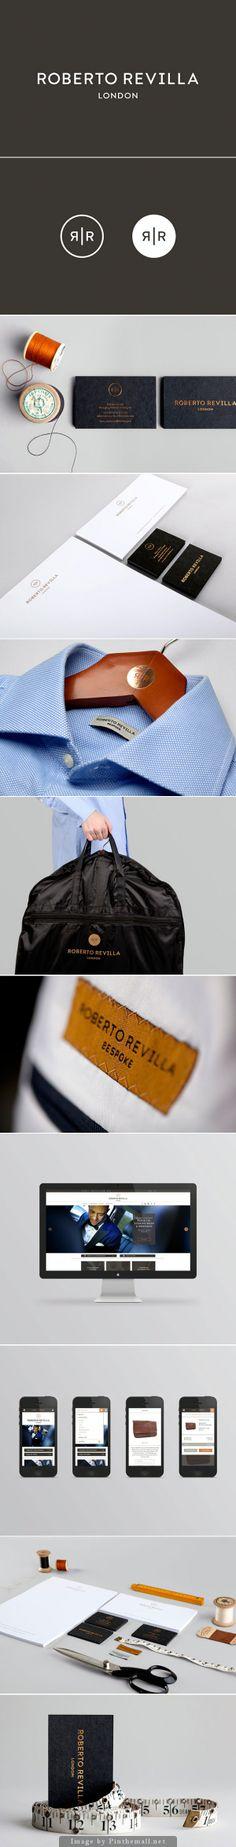 Identity design for bespoke London-based tailor Roberto Revilla by Friends